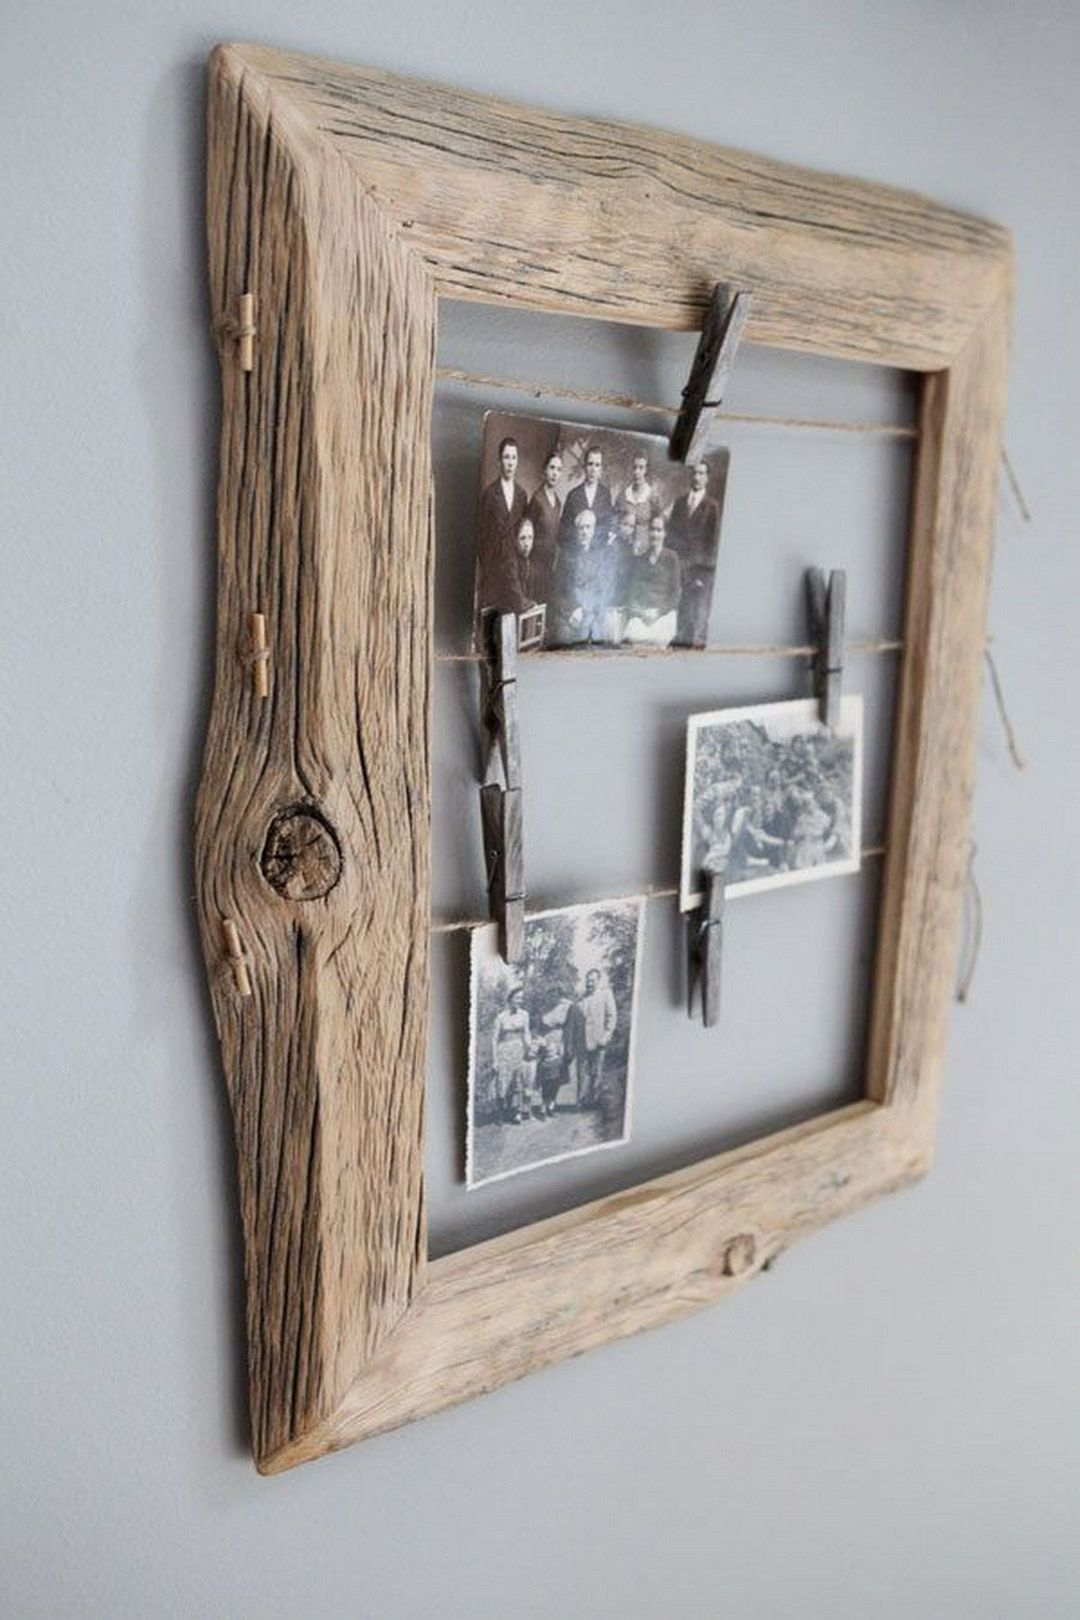 113 Beautiful Polaroid Photos Display Ideas Old Wood Crafts Photo On Wood Decor